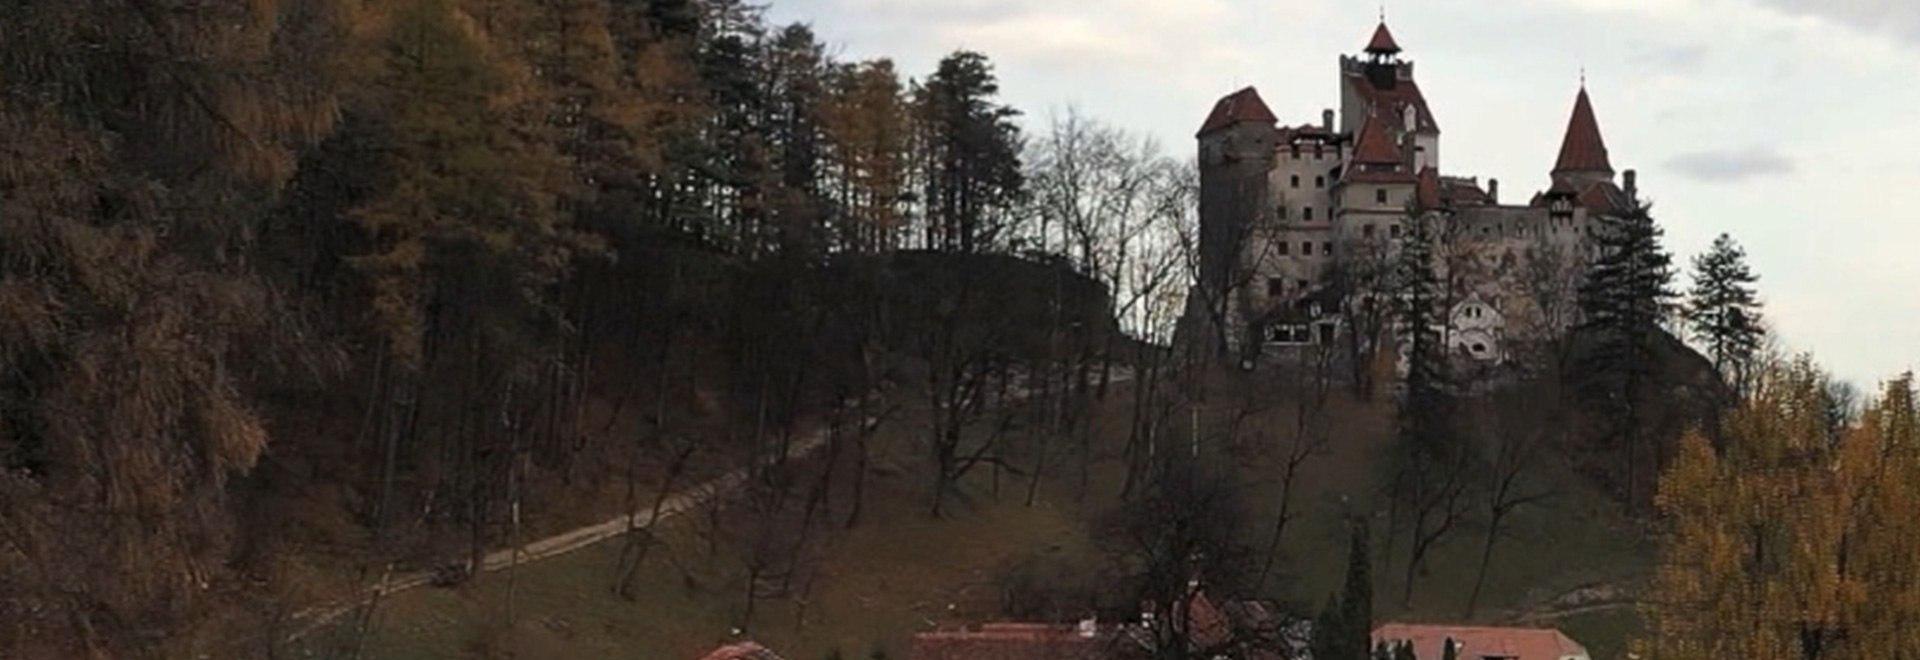 Transilvania: caccia, cultura e storia